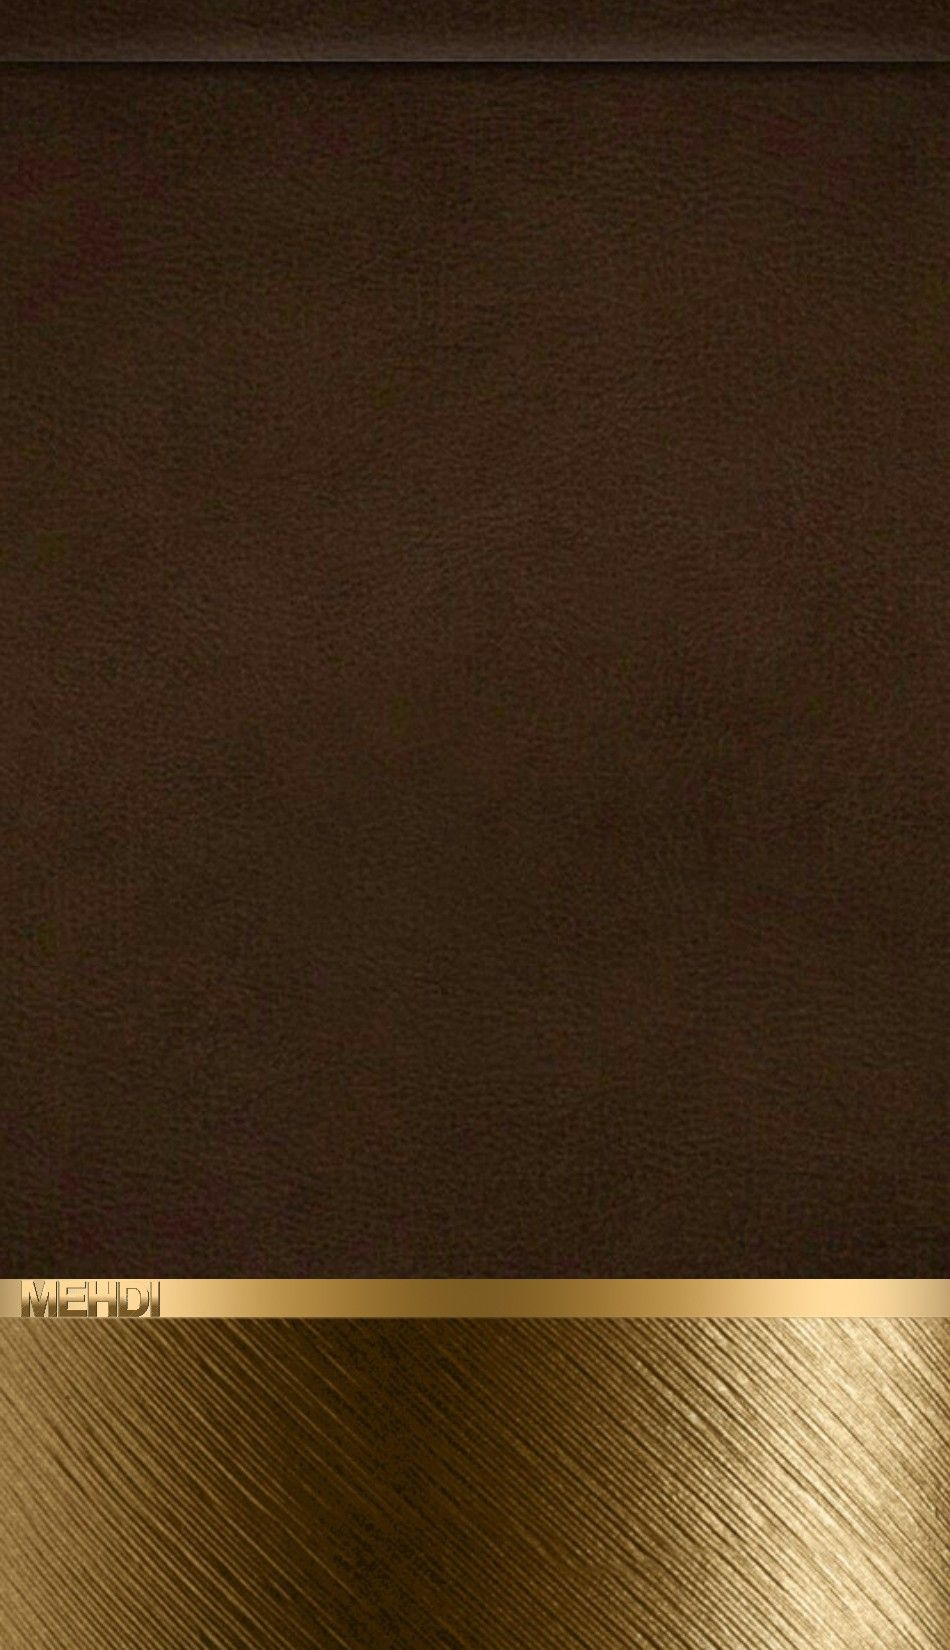 Wonderful Wallpaper Home Screen Wood - 3a8787c0c0b9710e37ac4657fdd13833  2018_542472.jpg